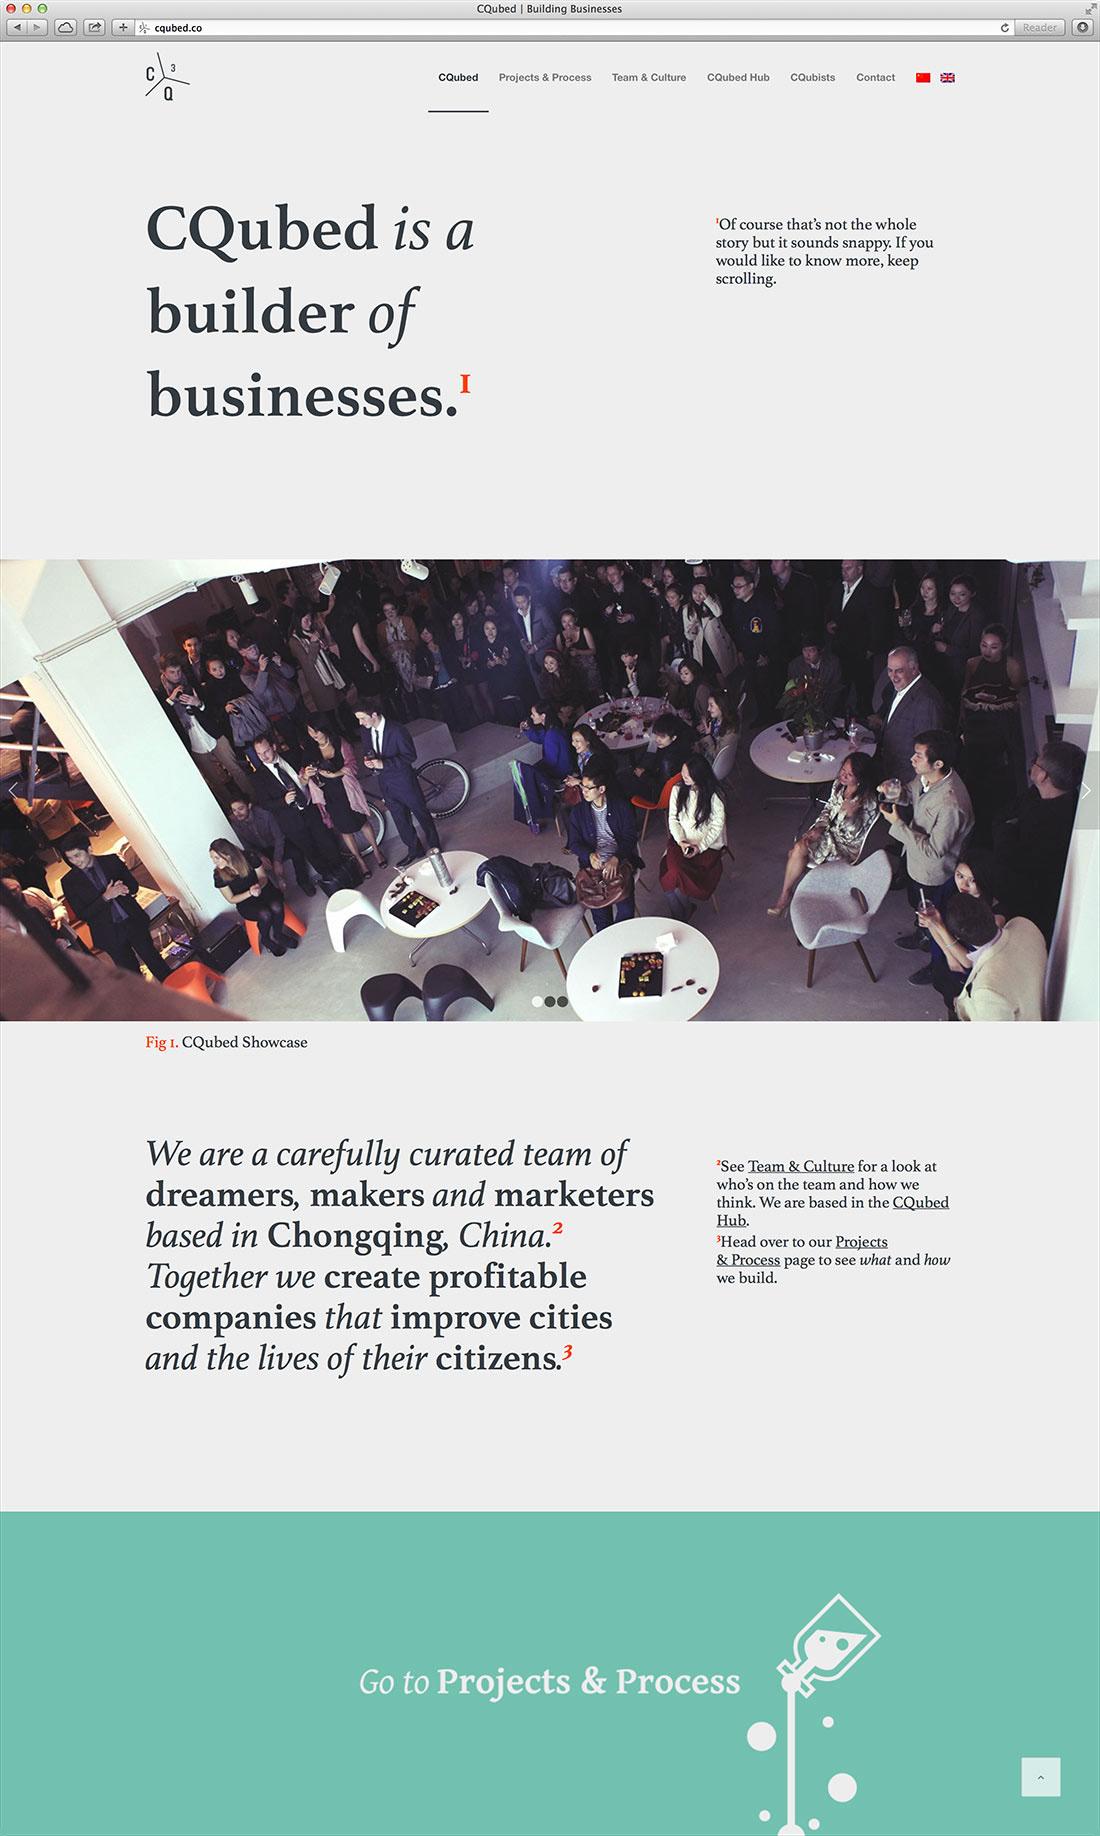 Website company school intern Food  arnaud CQubed CQubists enchanted KatarinaPahlson Adamson Fine Arts PriestmanArchitects architects